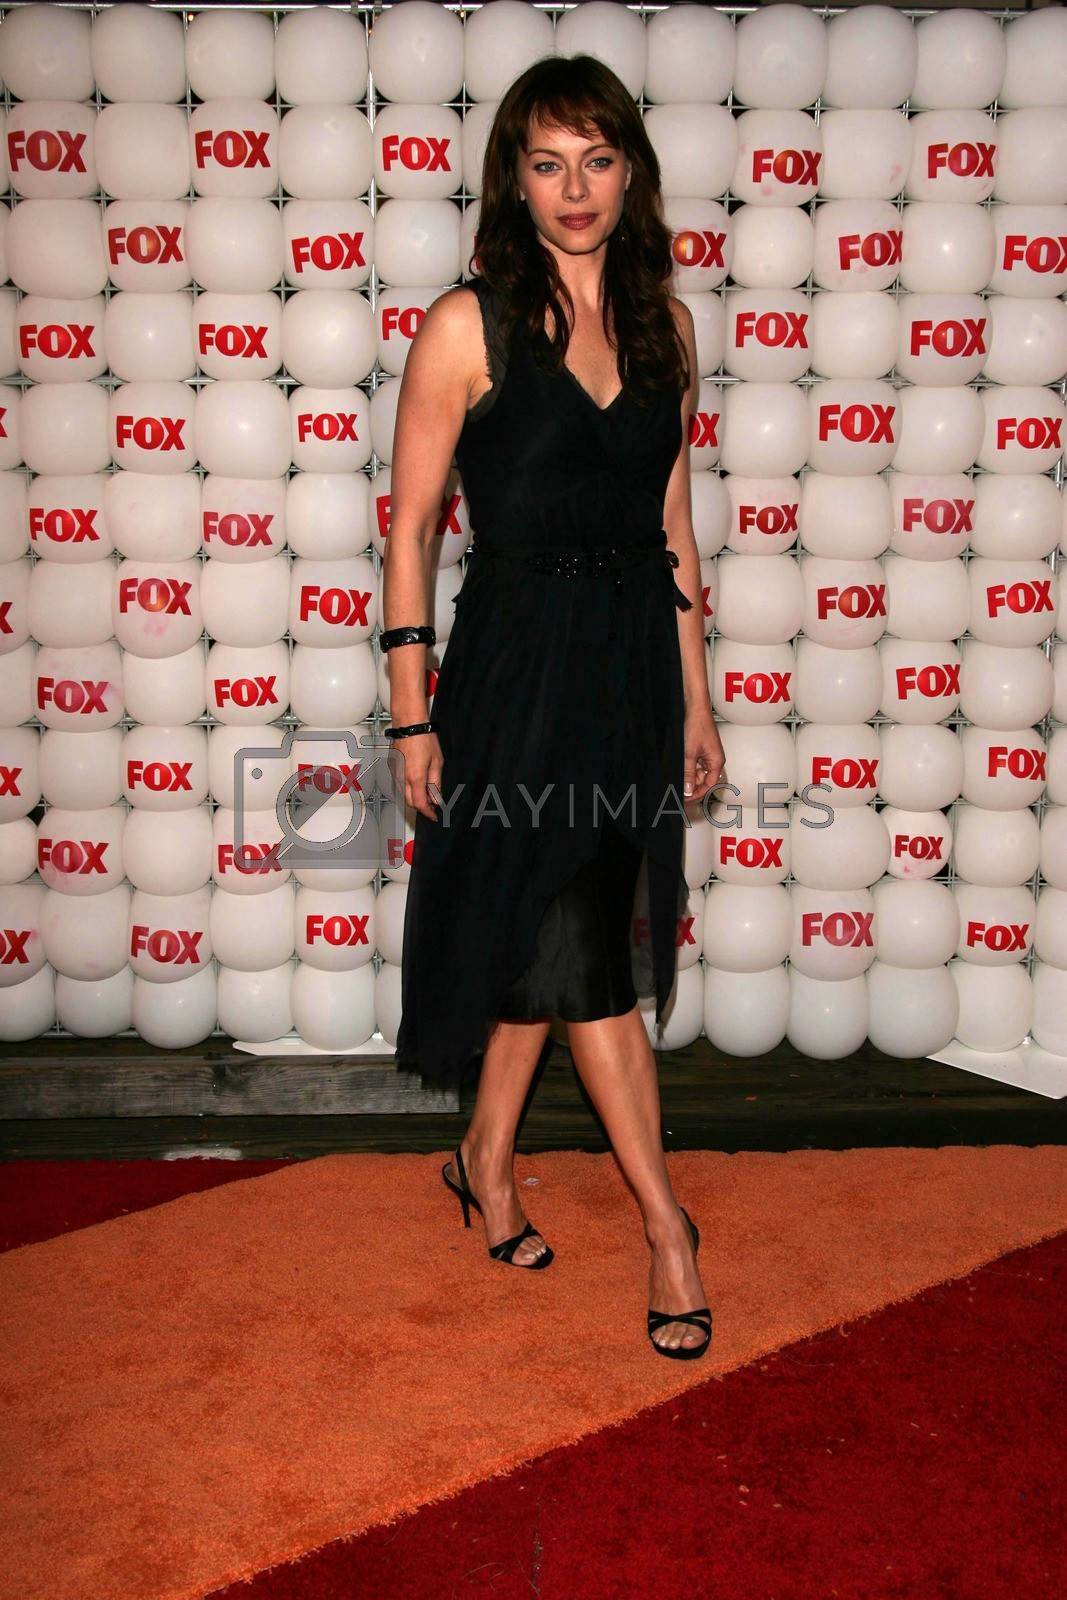 Melinda Clarke At the FOX Summer 2005 TCA Party, Santa Monica Pier, Santa Monica, CA 07-29-05